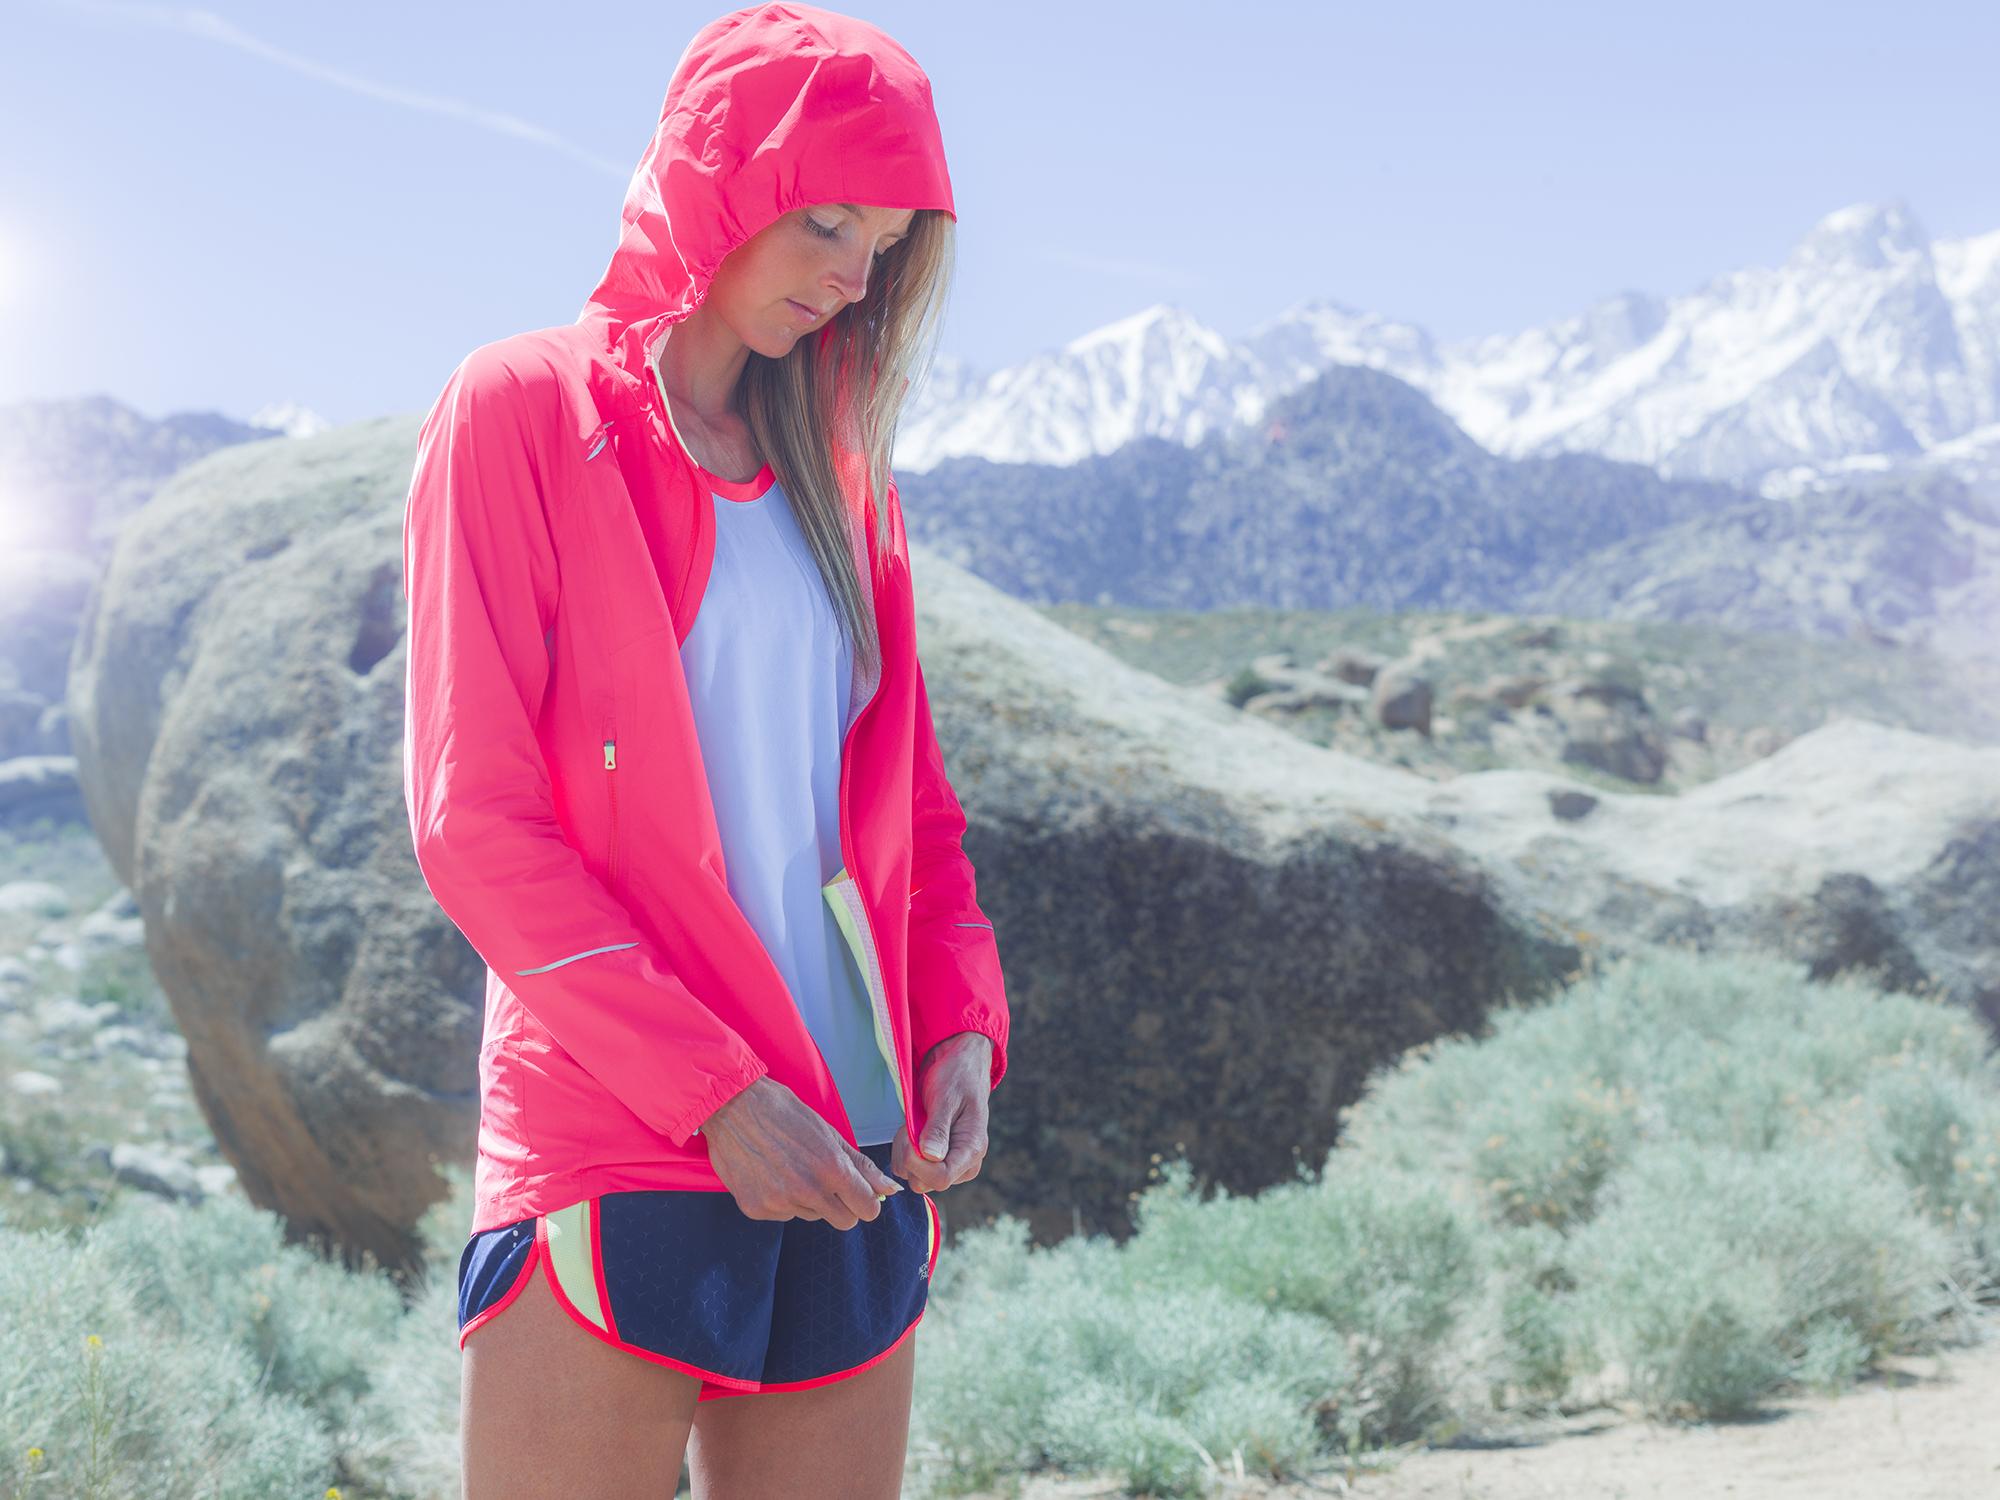 Stephanie Howe. Sierra Nevada, CA. Photography by Tim Kemple.